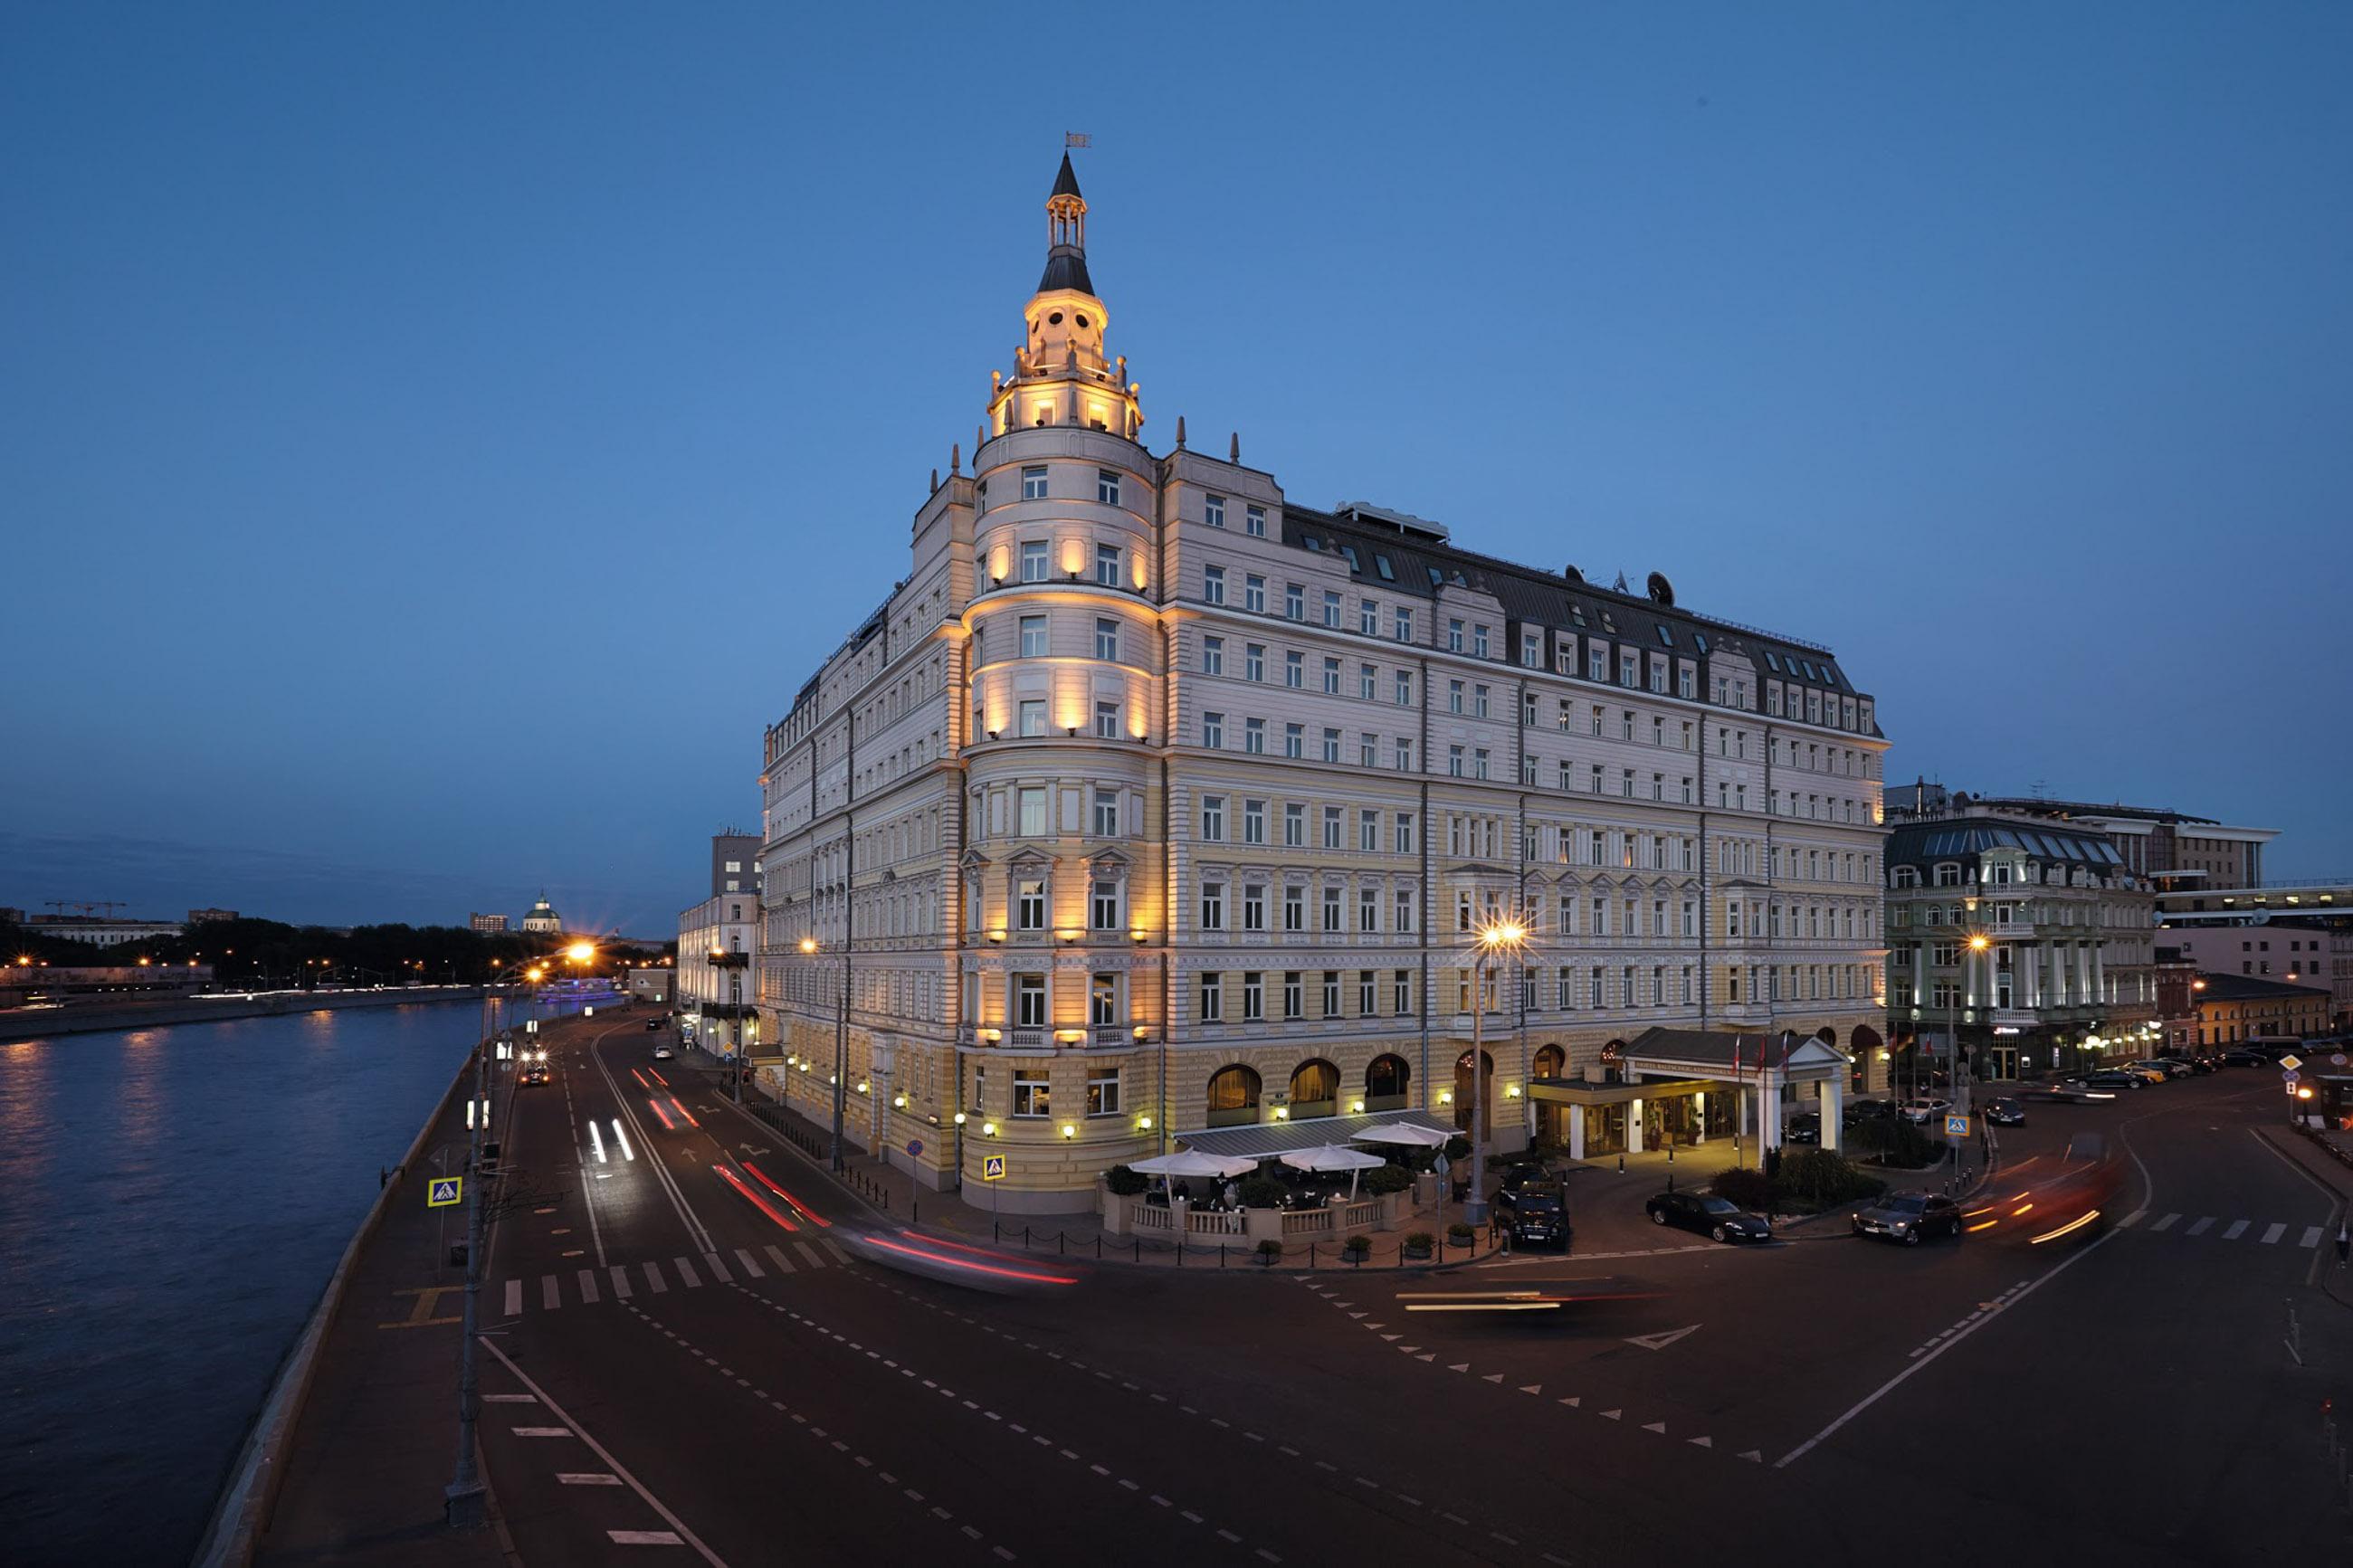 https://bubo.sk/uploads/galleries/5055/kempinski_moskva_rusko_hotel-baltschug-kempinski-moscow_12604_print.jpg